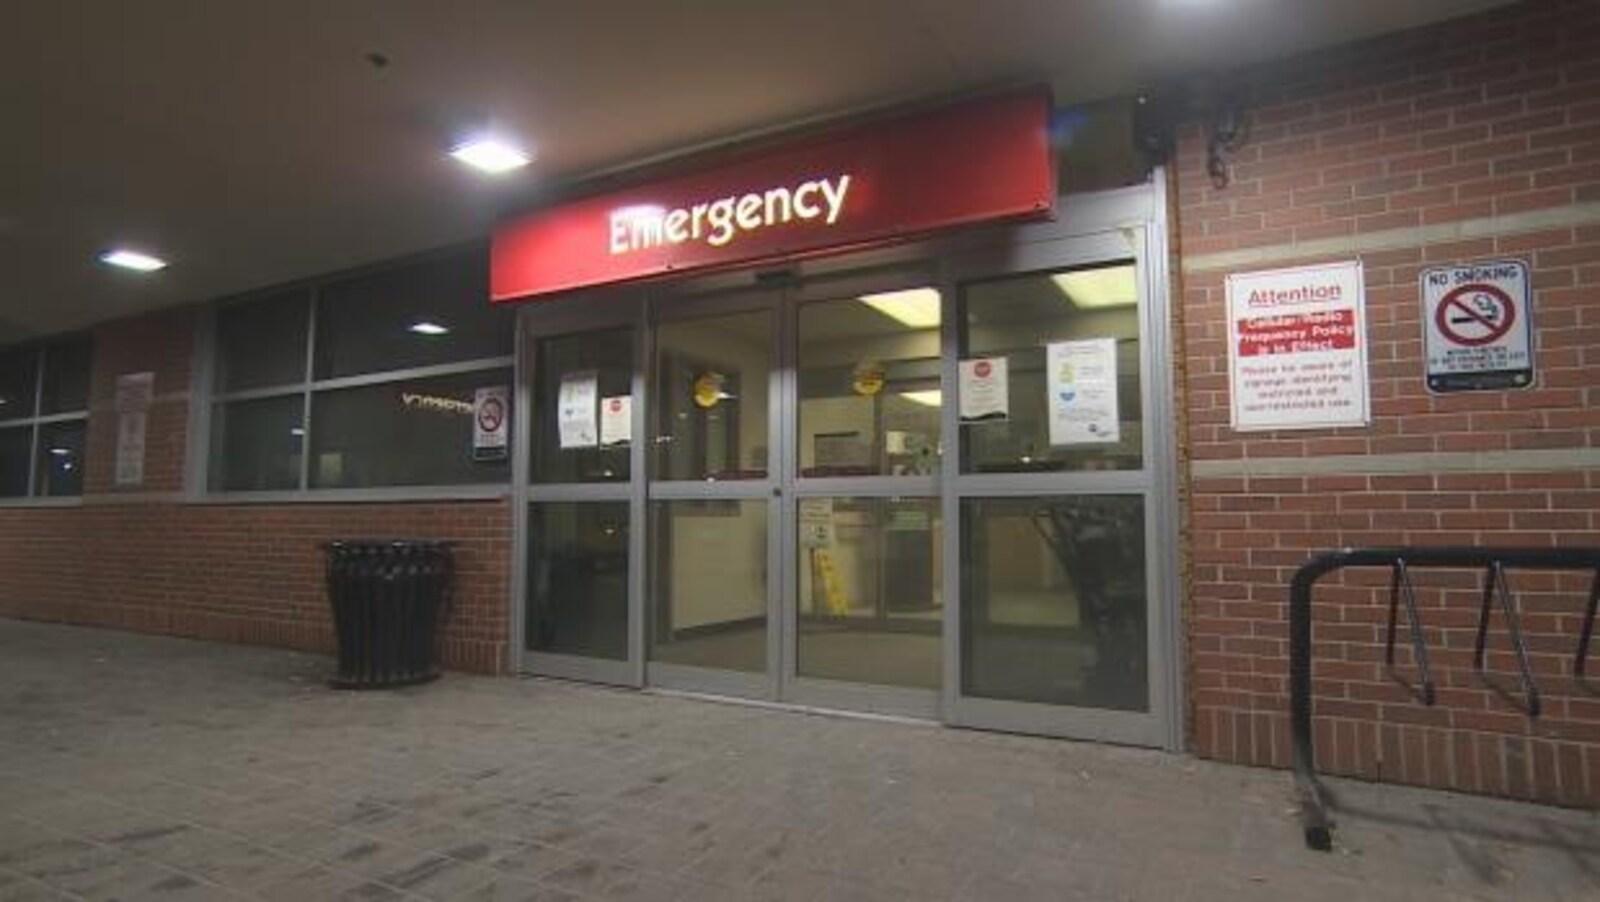 L'entrée de l'urgence à l'hôpital Lakeridge Health d'Oshawa